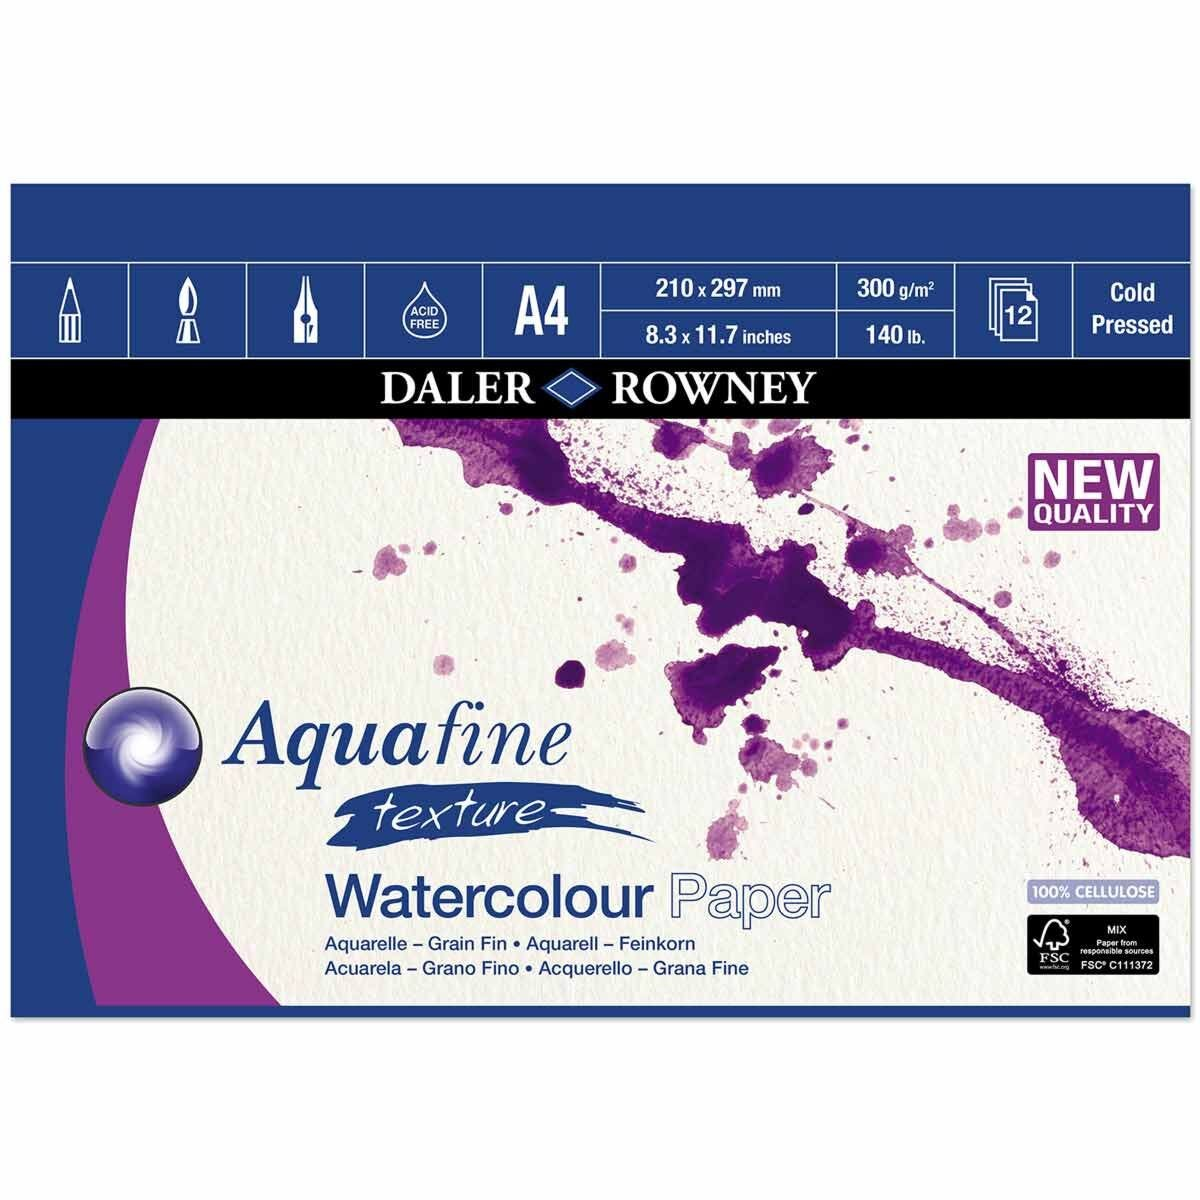 Daler Rowney Aquafine Watercolour Pad A4